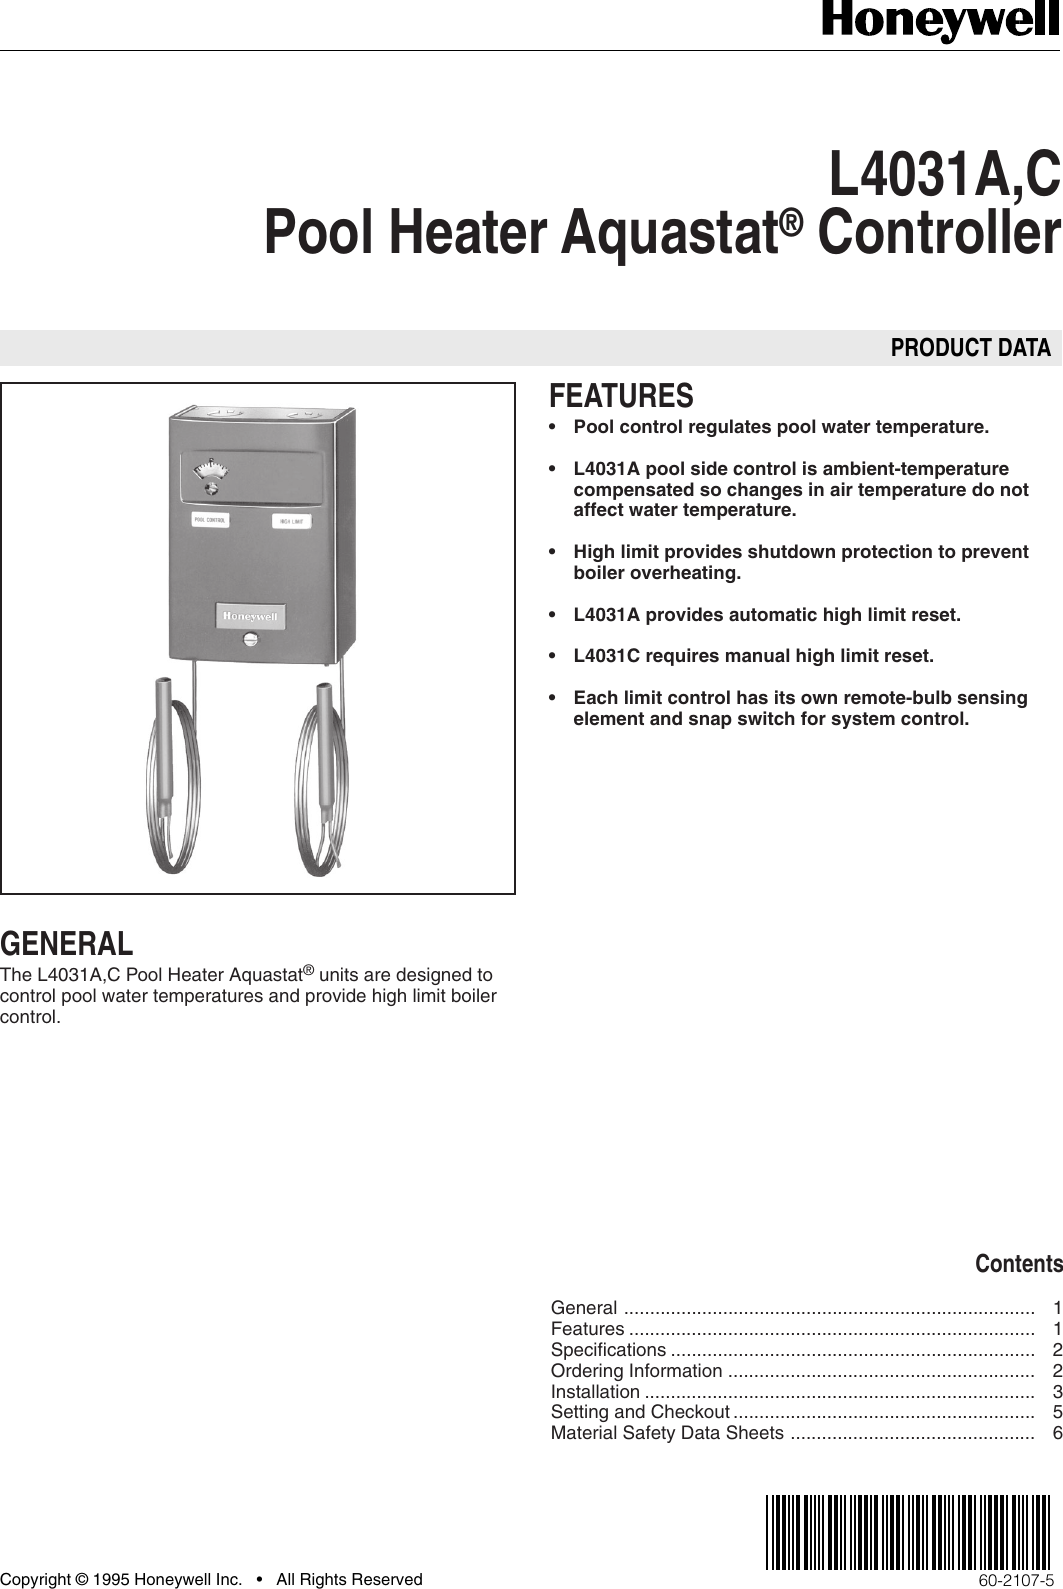 Honeywell C Users Manual 60 2107 L4031ac Pool Heater Aquastat Boiler Wiring Diagram Page 1 Of 12